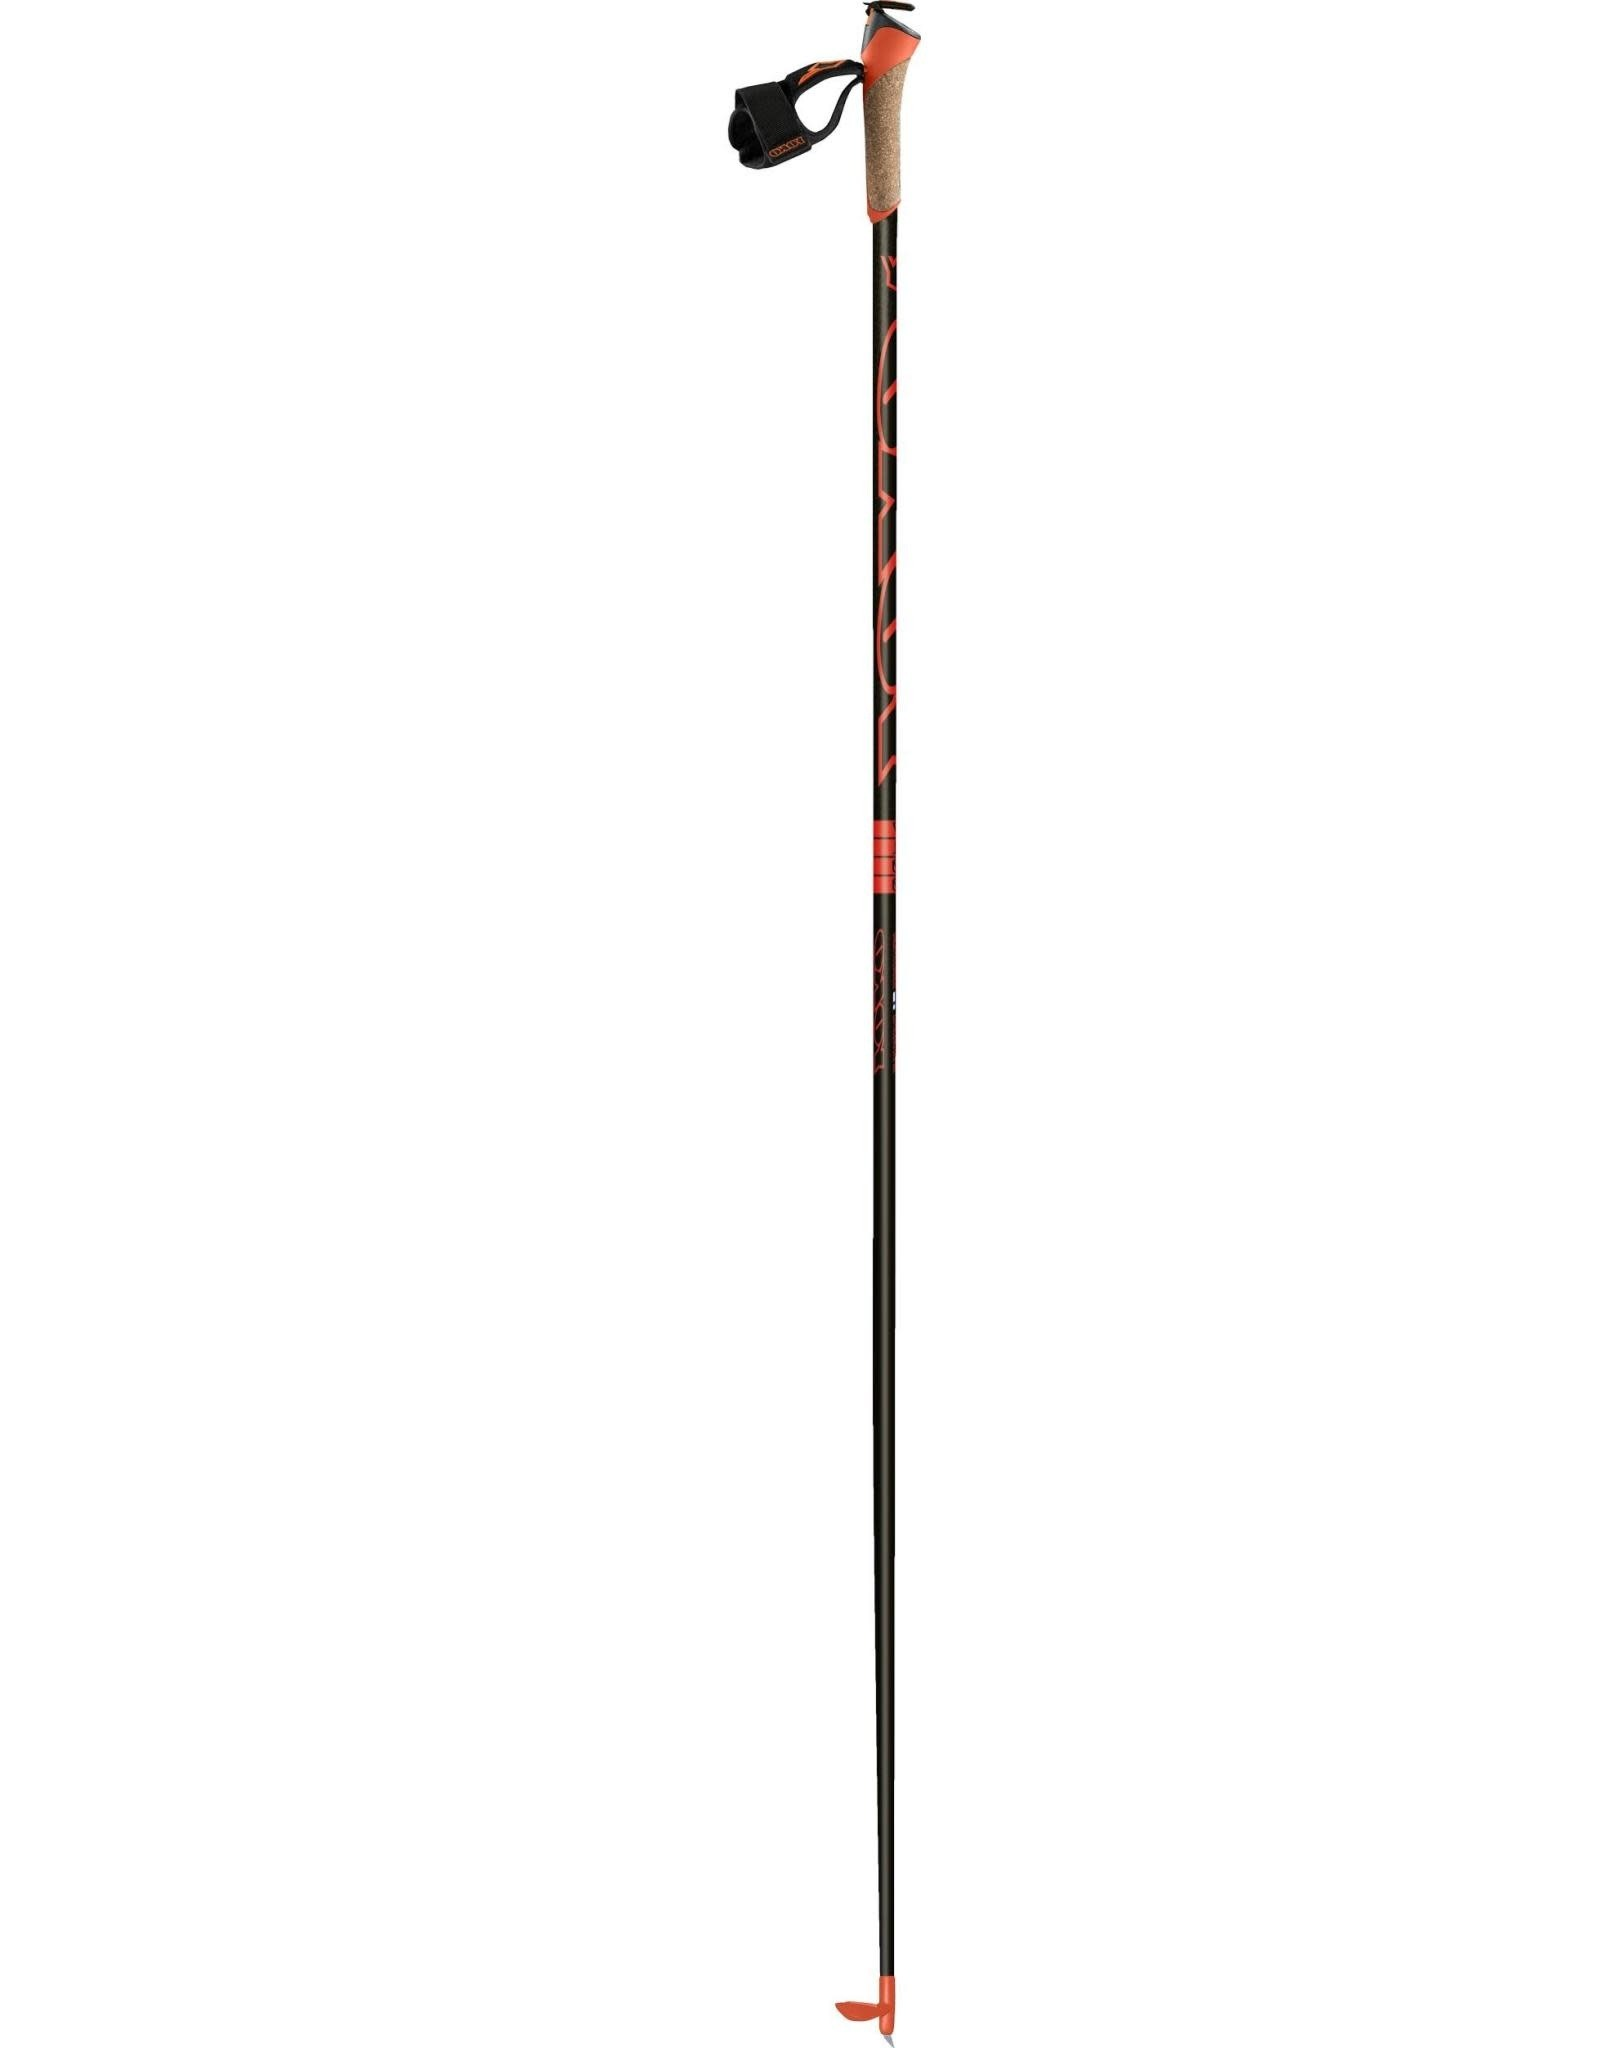 Yoko Yoko 7100 Series Pole